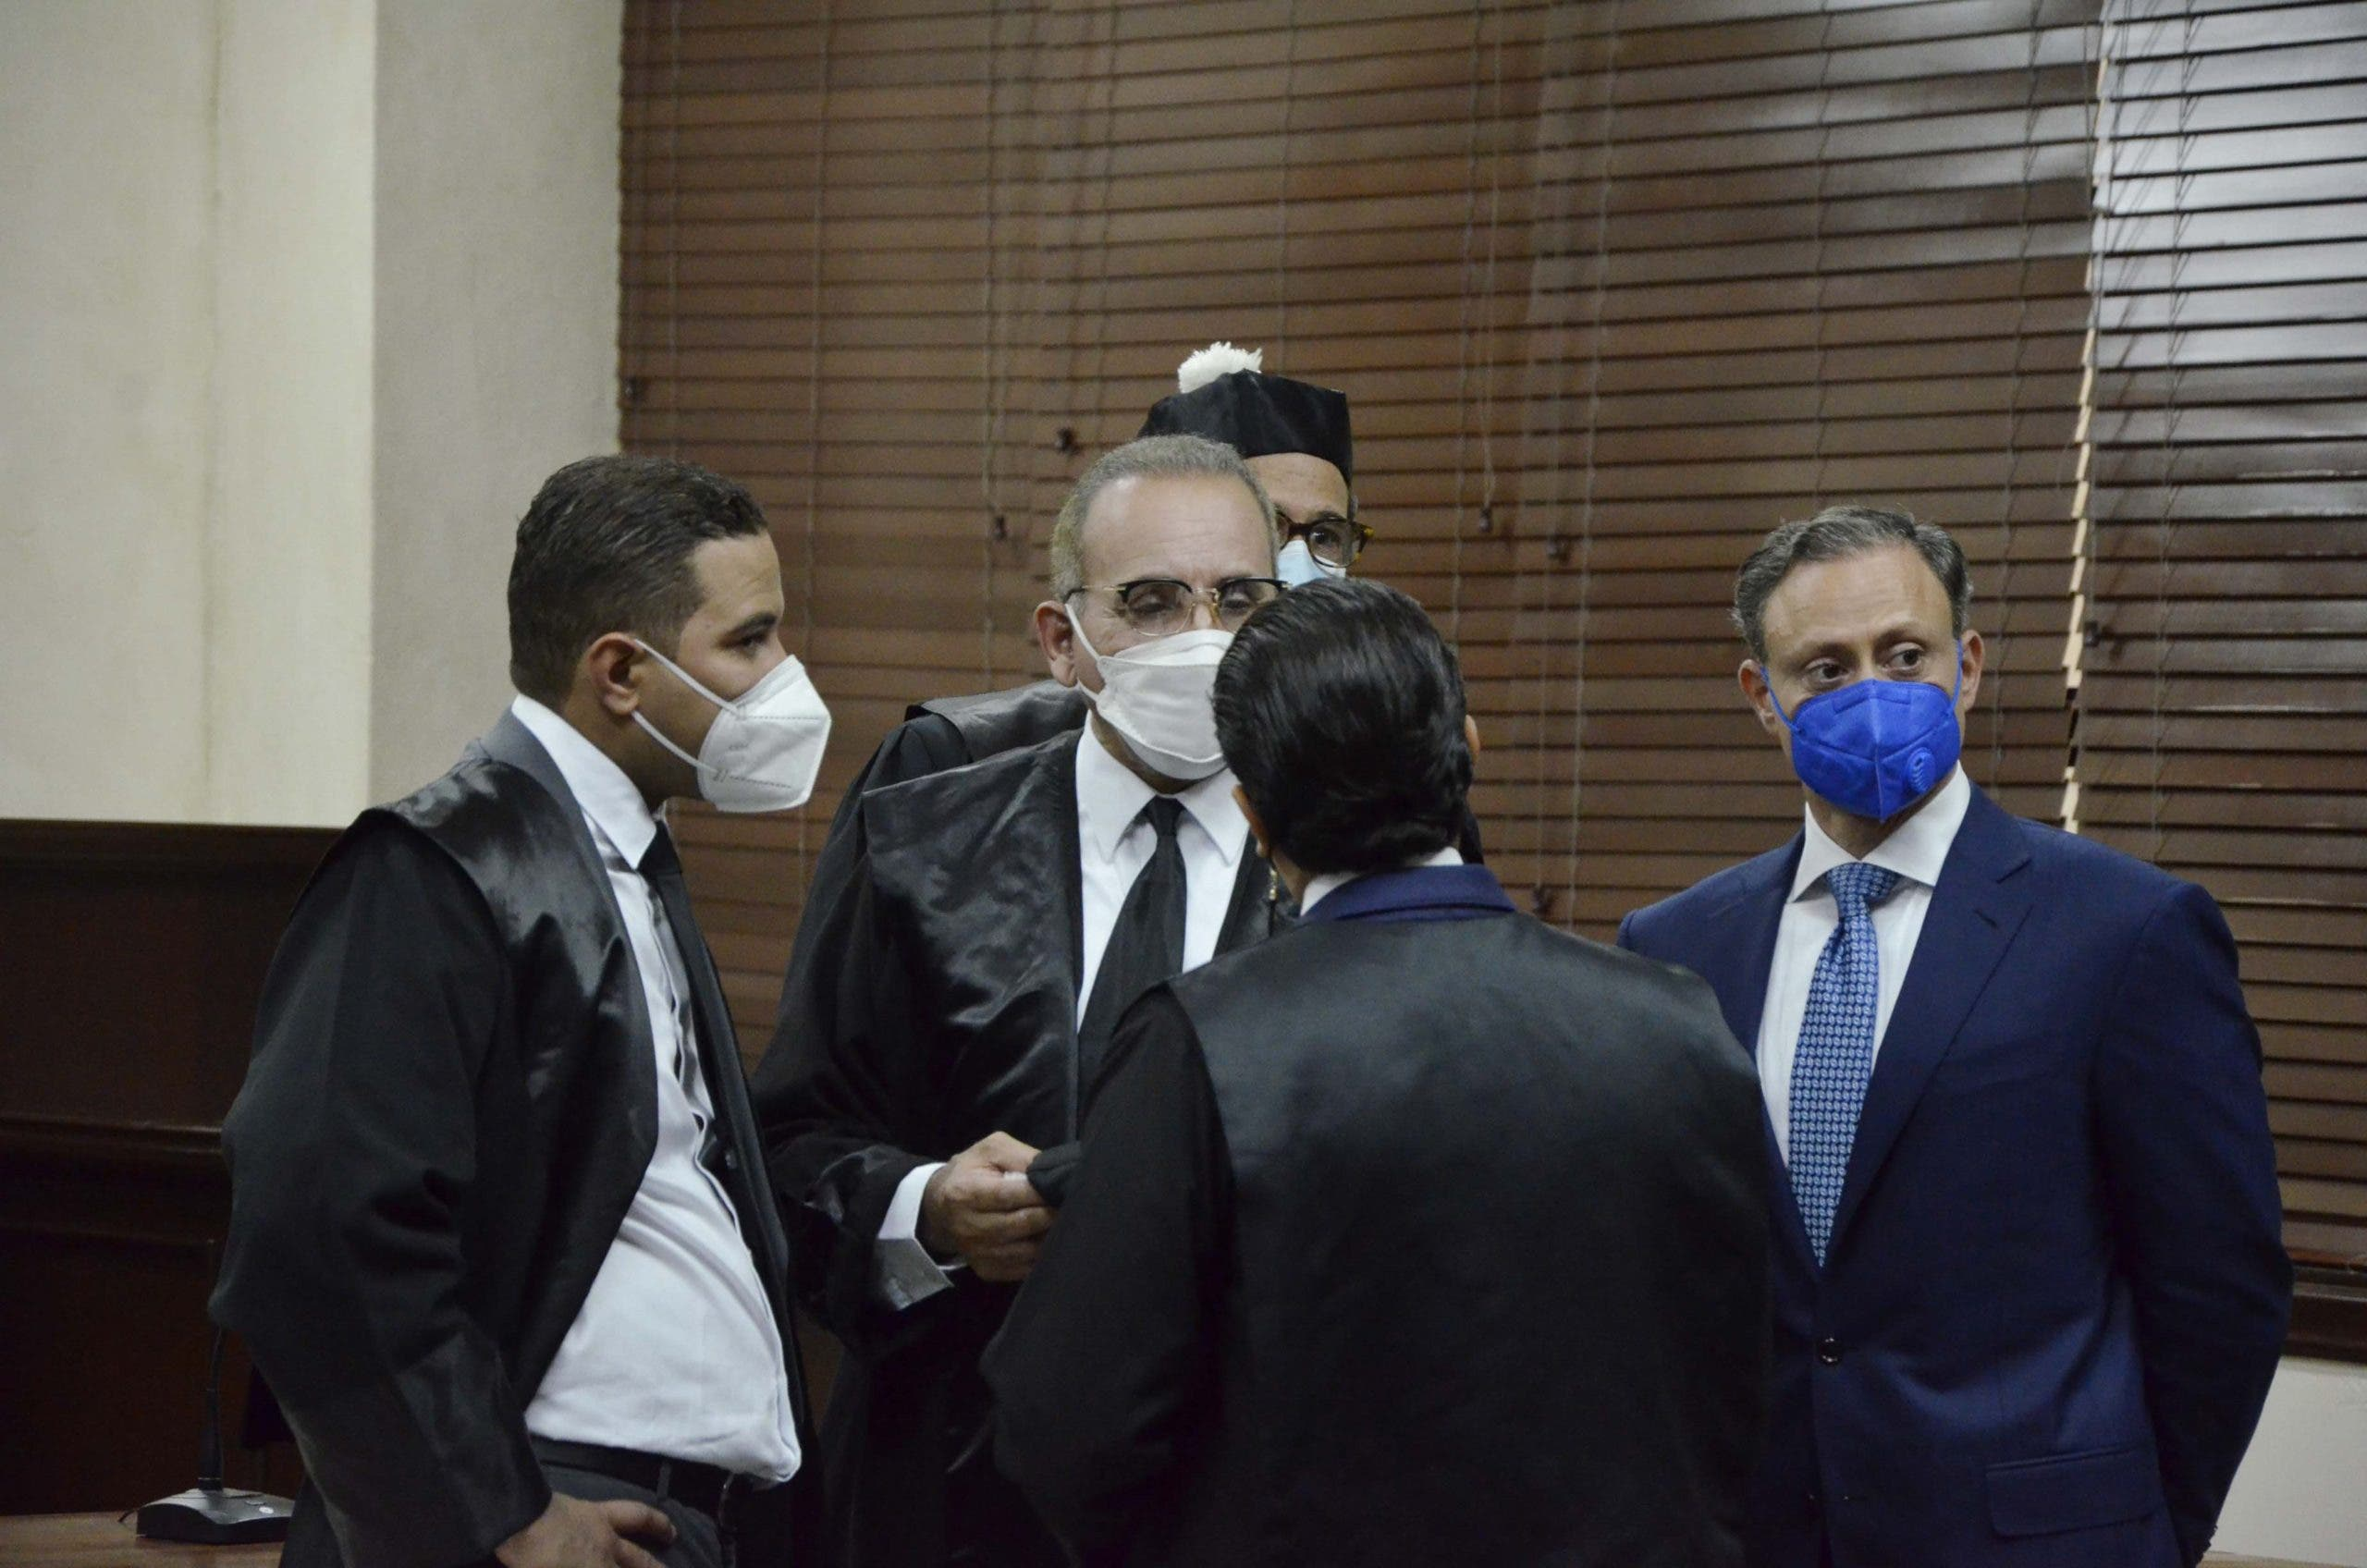 Abogados de Jean Alain Rodríguez interpondrán un recurso de casación ante la SCJ contra rechazo apelación